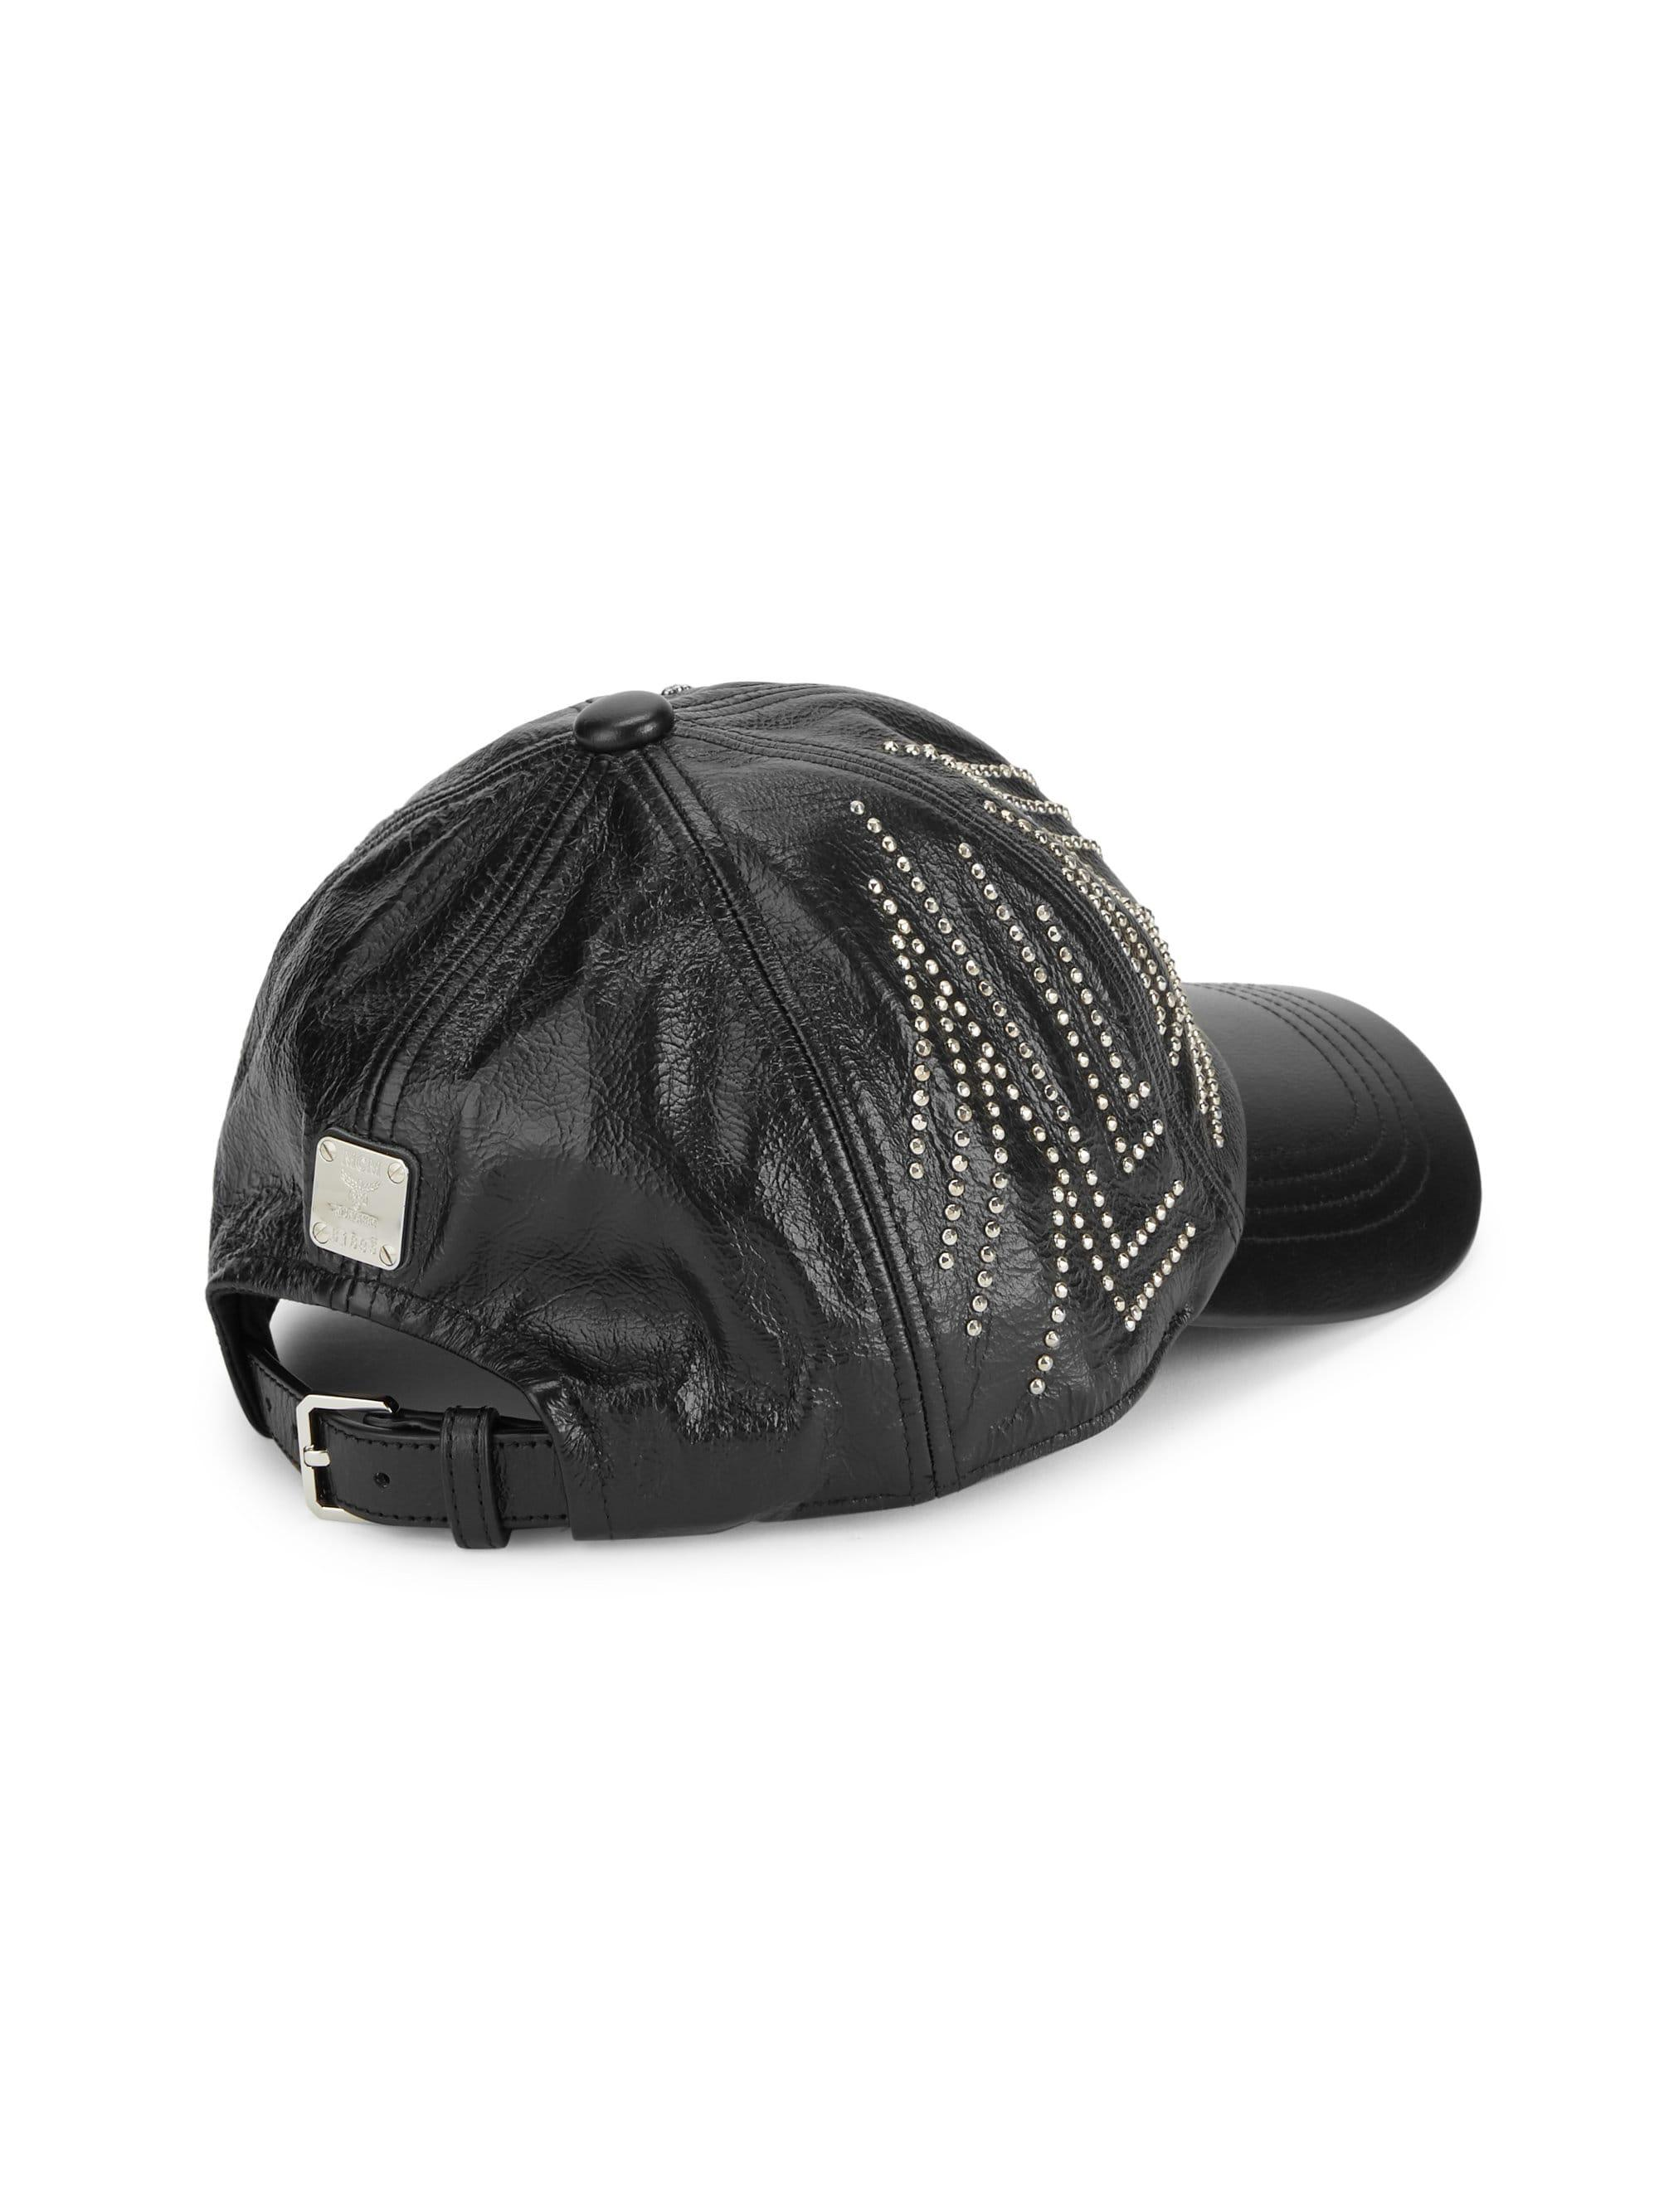 67a18bcac82 MCM - Black Gunta Stud Leather Baseball Cap for Men - Lyst. View fullscreen